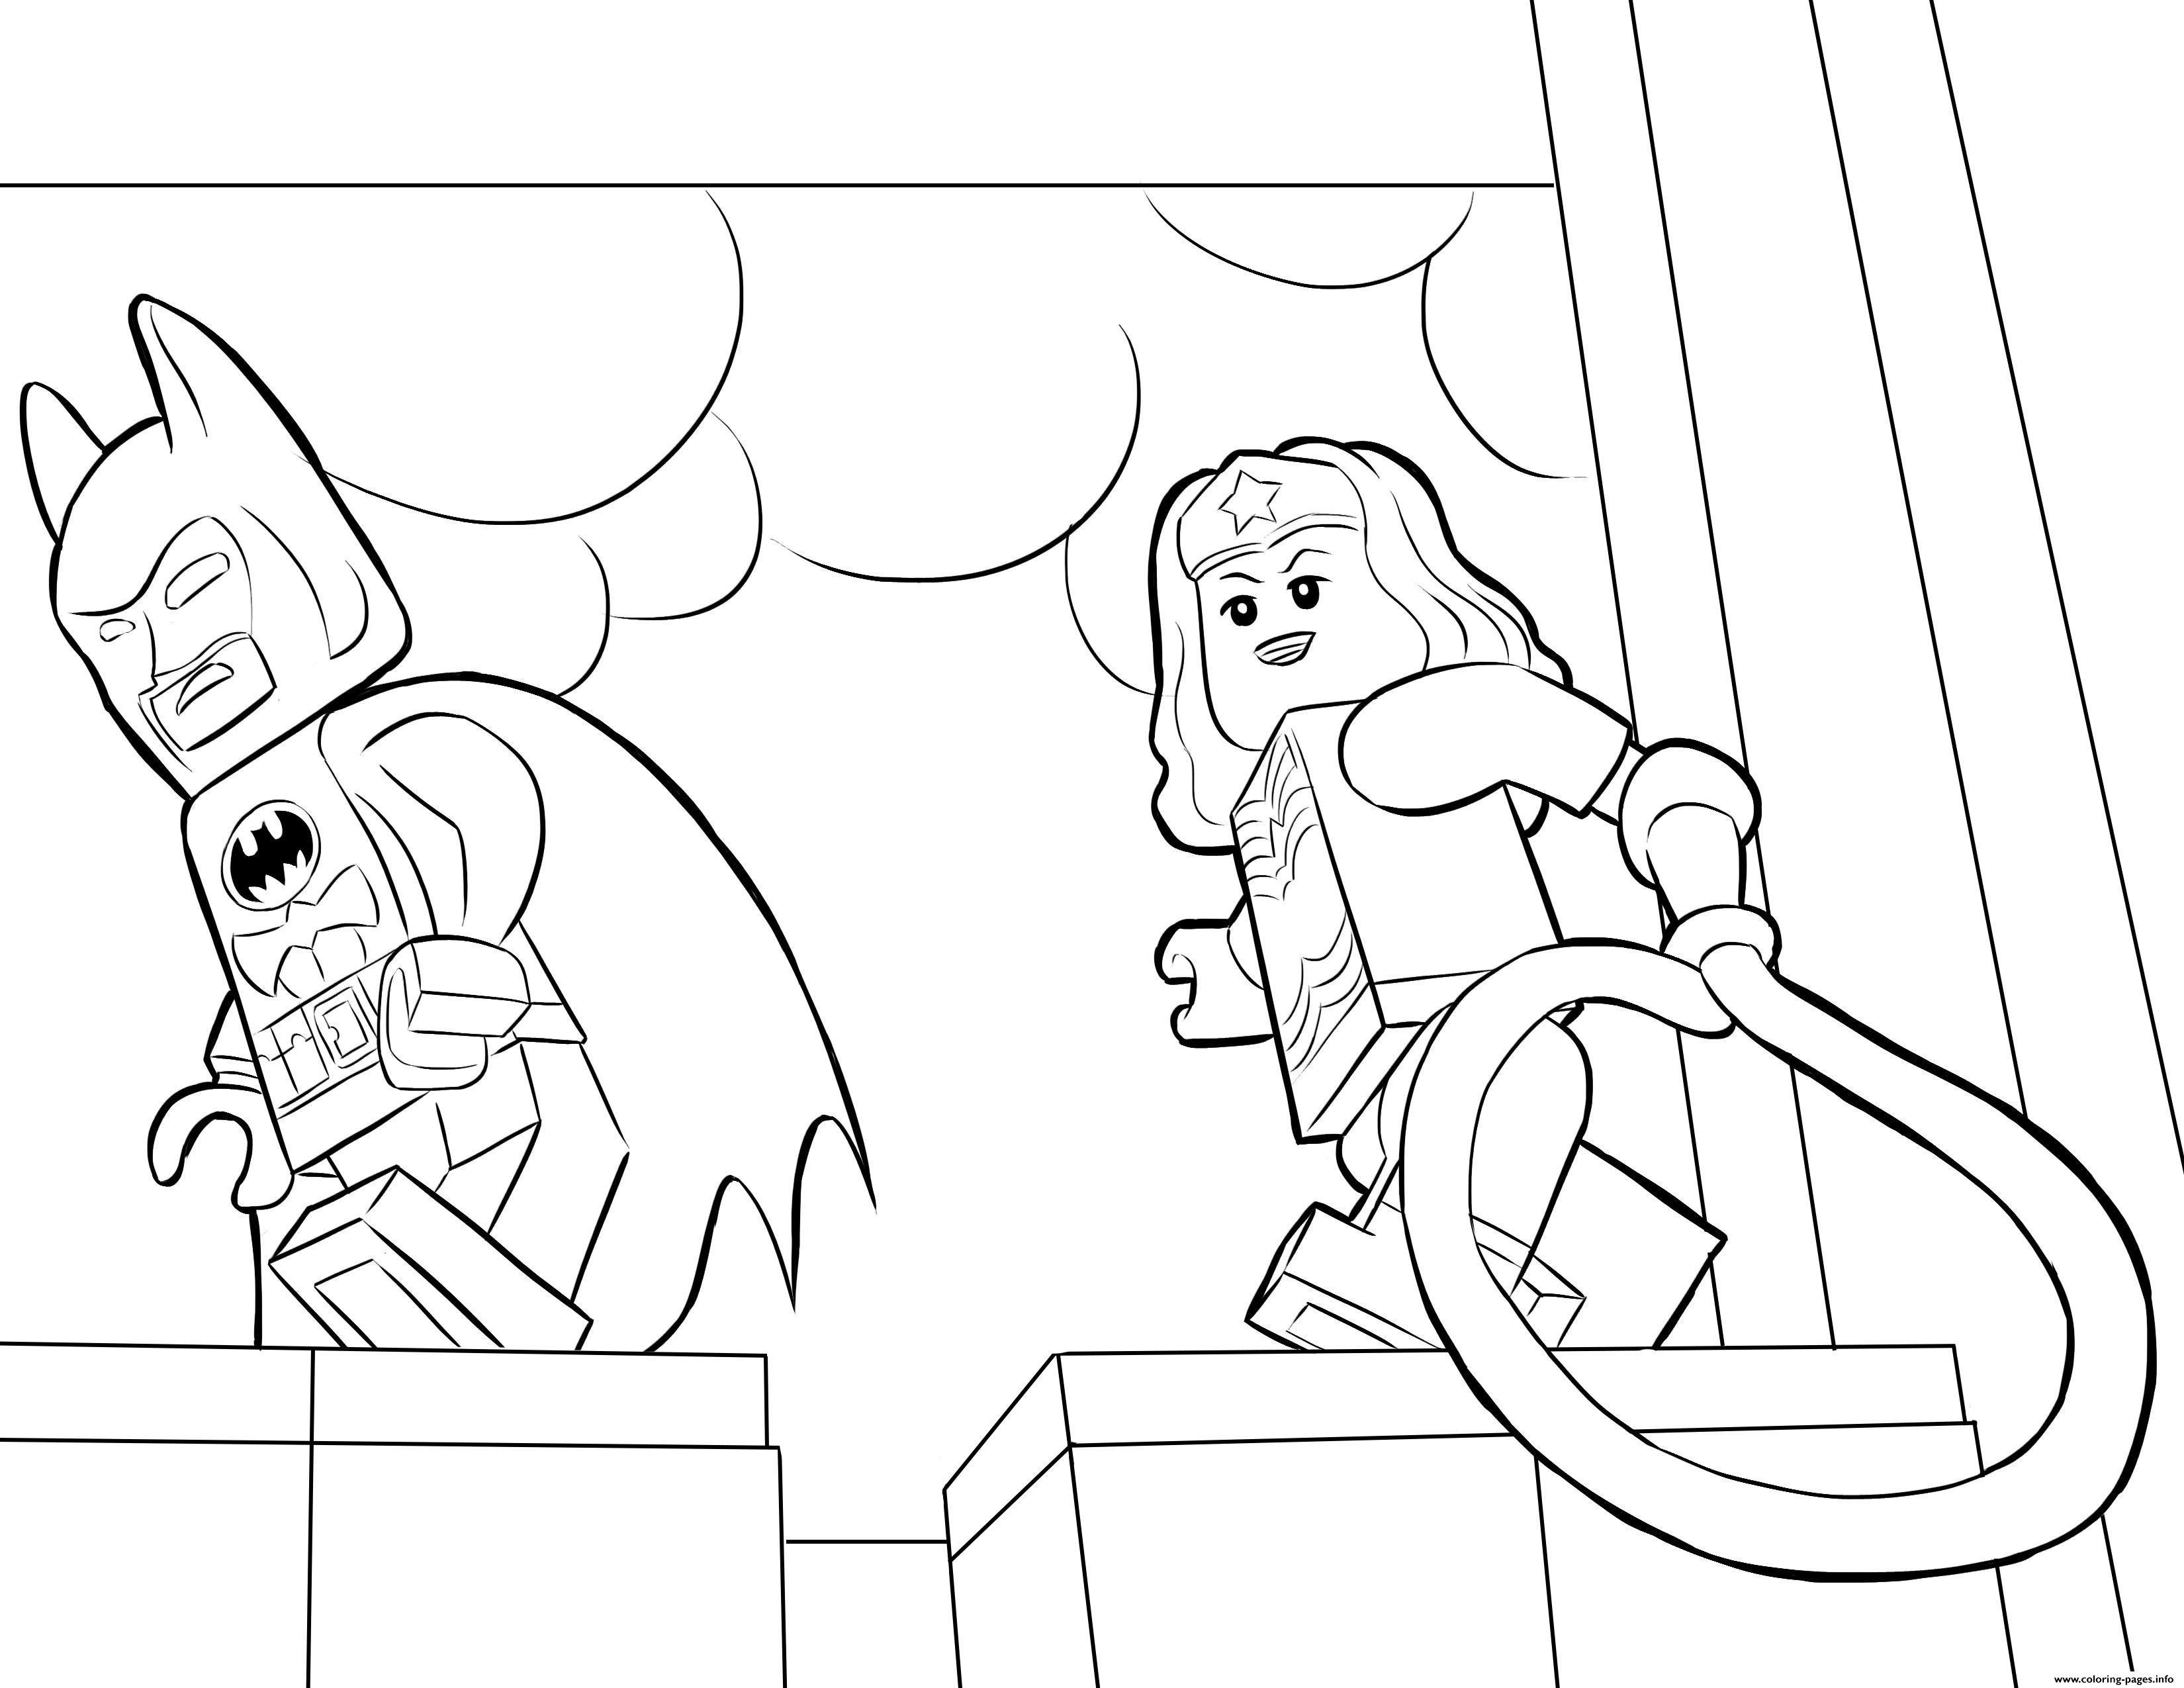 Printable coloring pages lego batman - Printable Coloring Pages Lego Batman 29